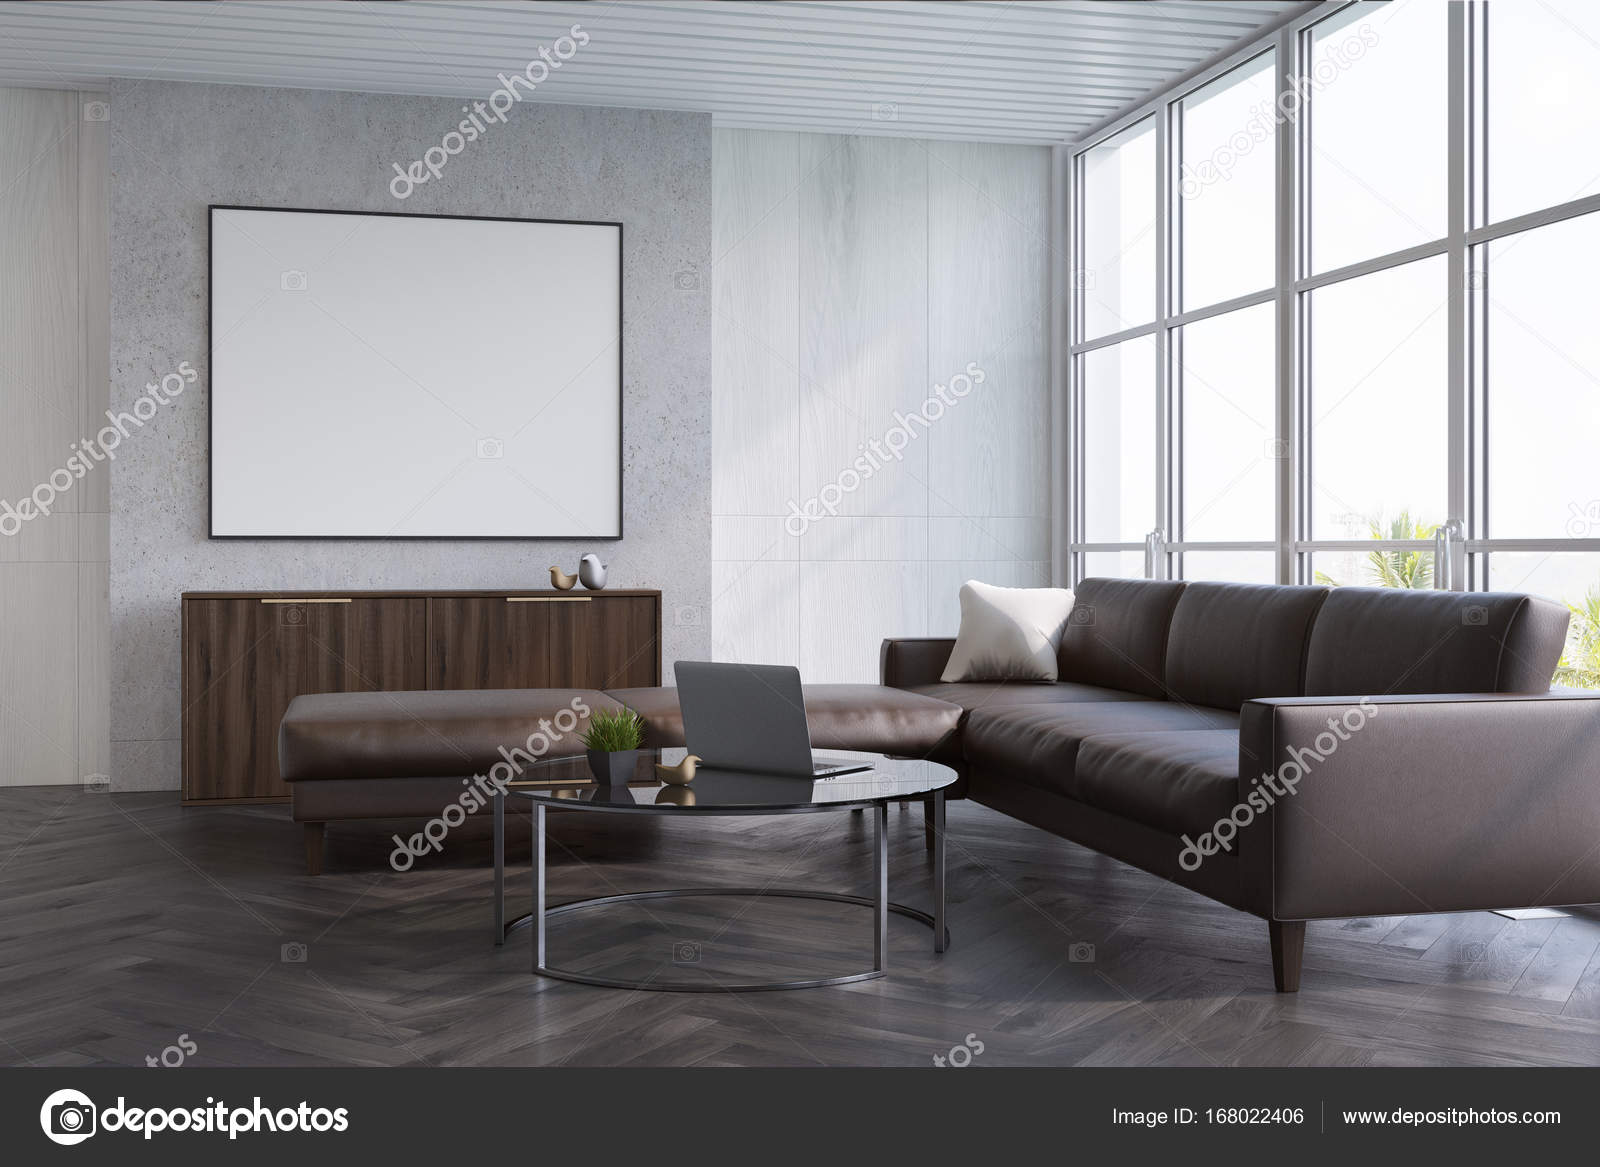 Grijze woonkamer, sofa en poster — Stockfoto © denisismagilov #168022406